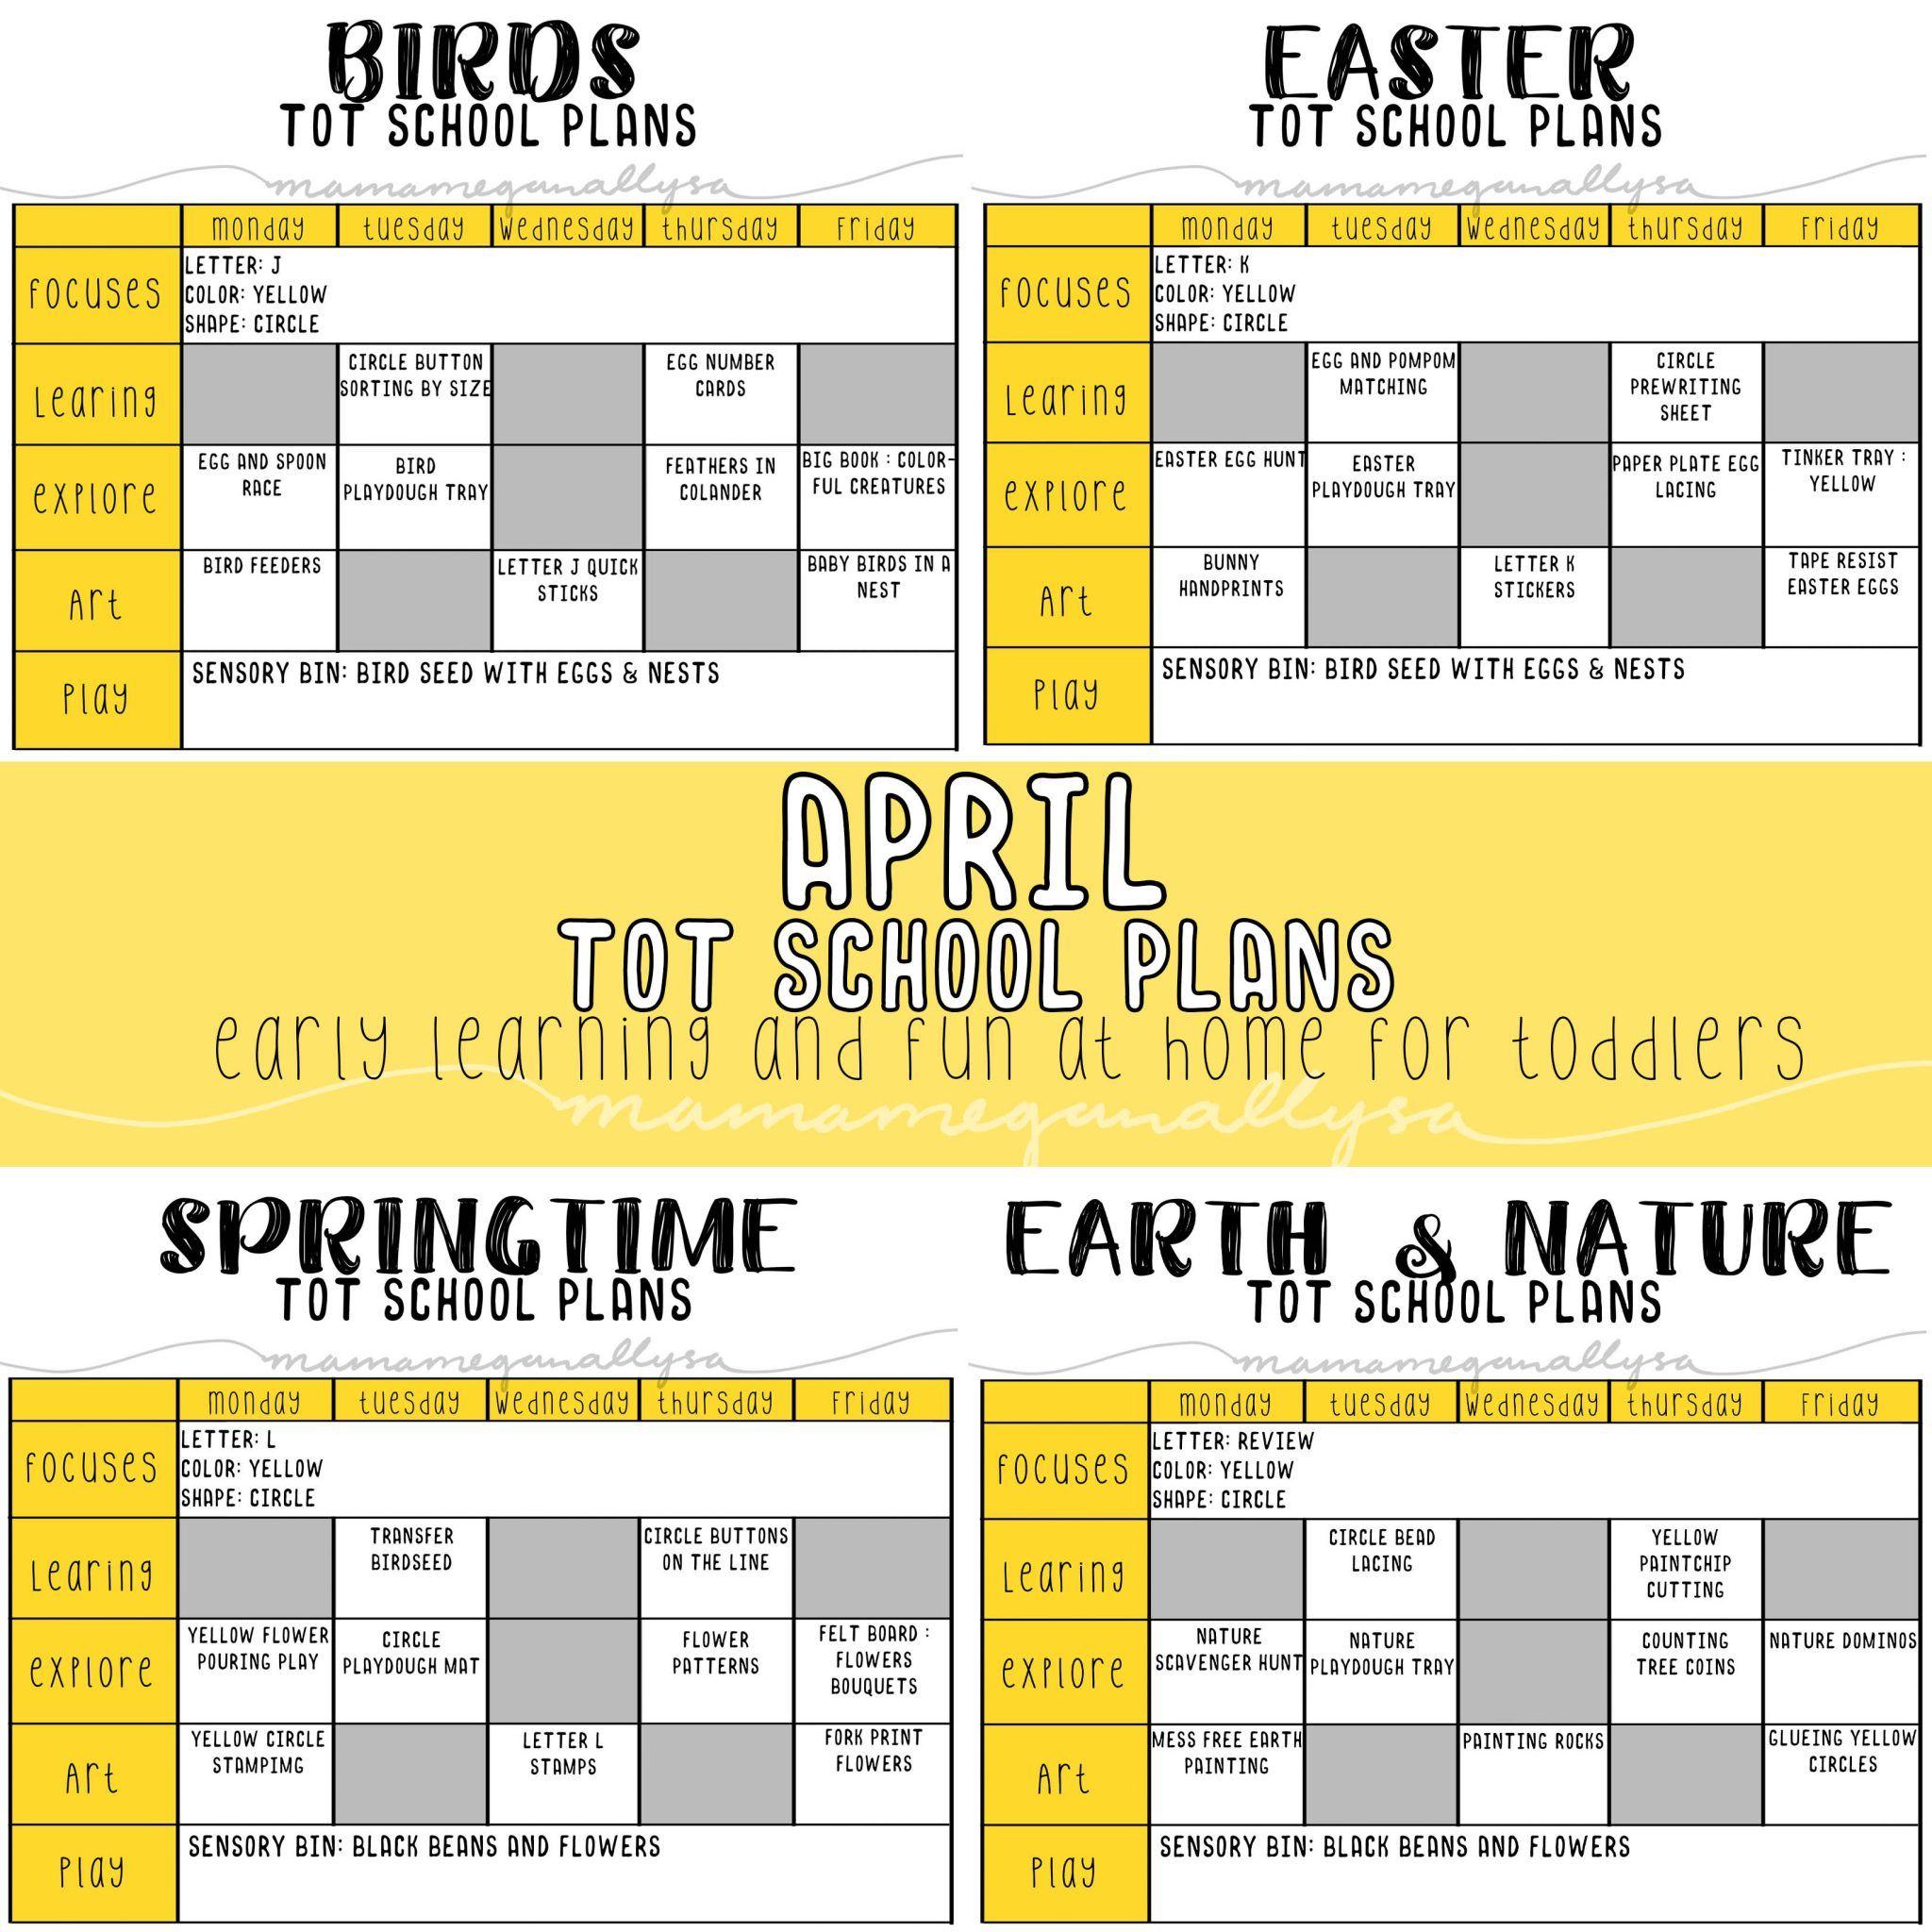 April Tot School Plans For Springtime Fun